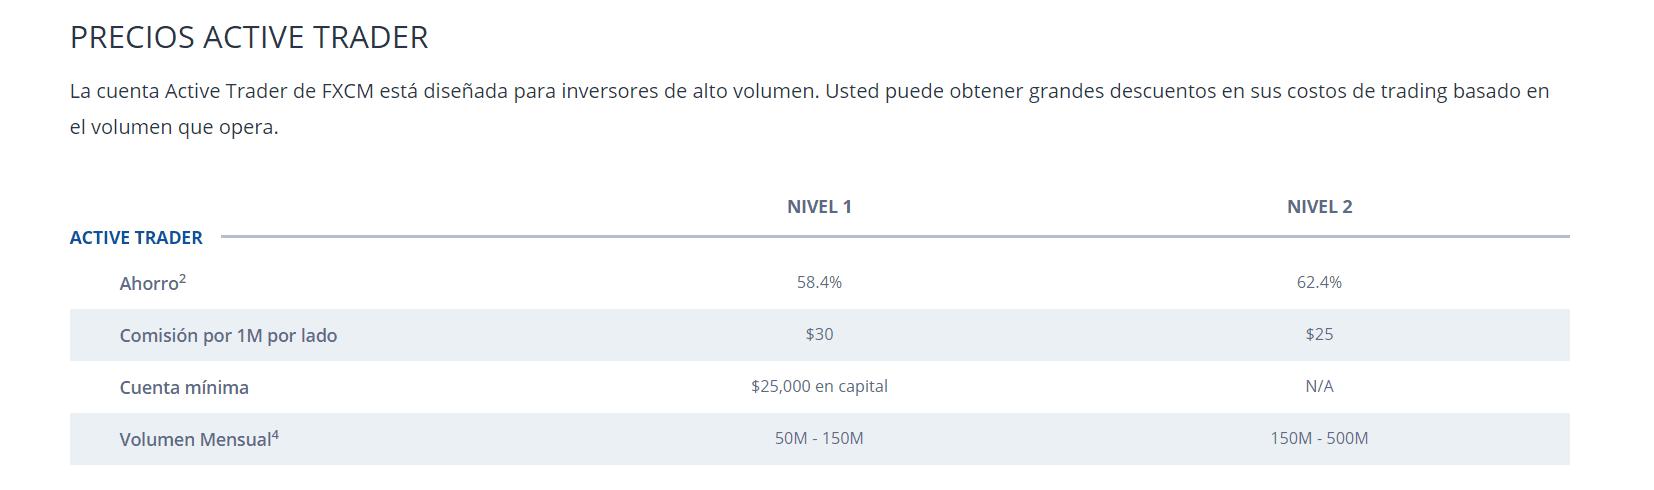 comisiones Active Trader Fxcm